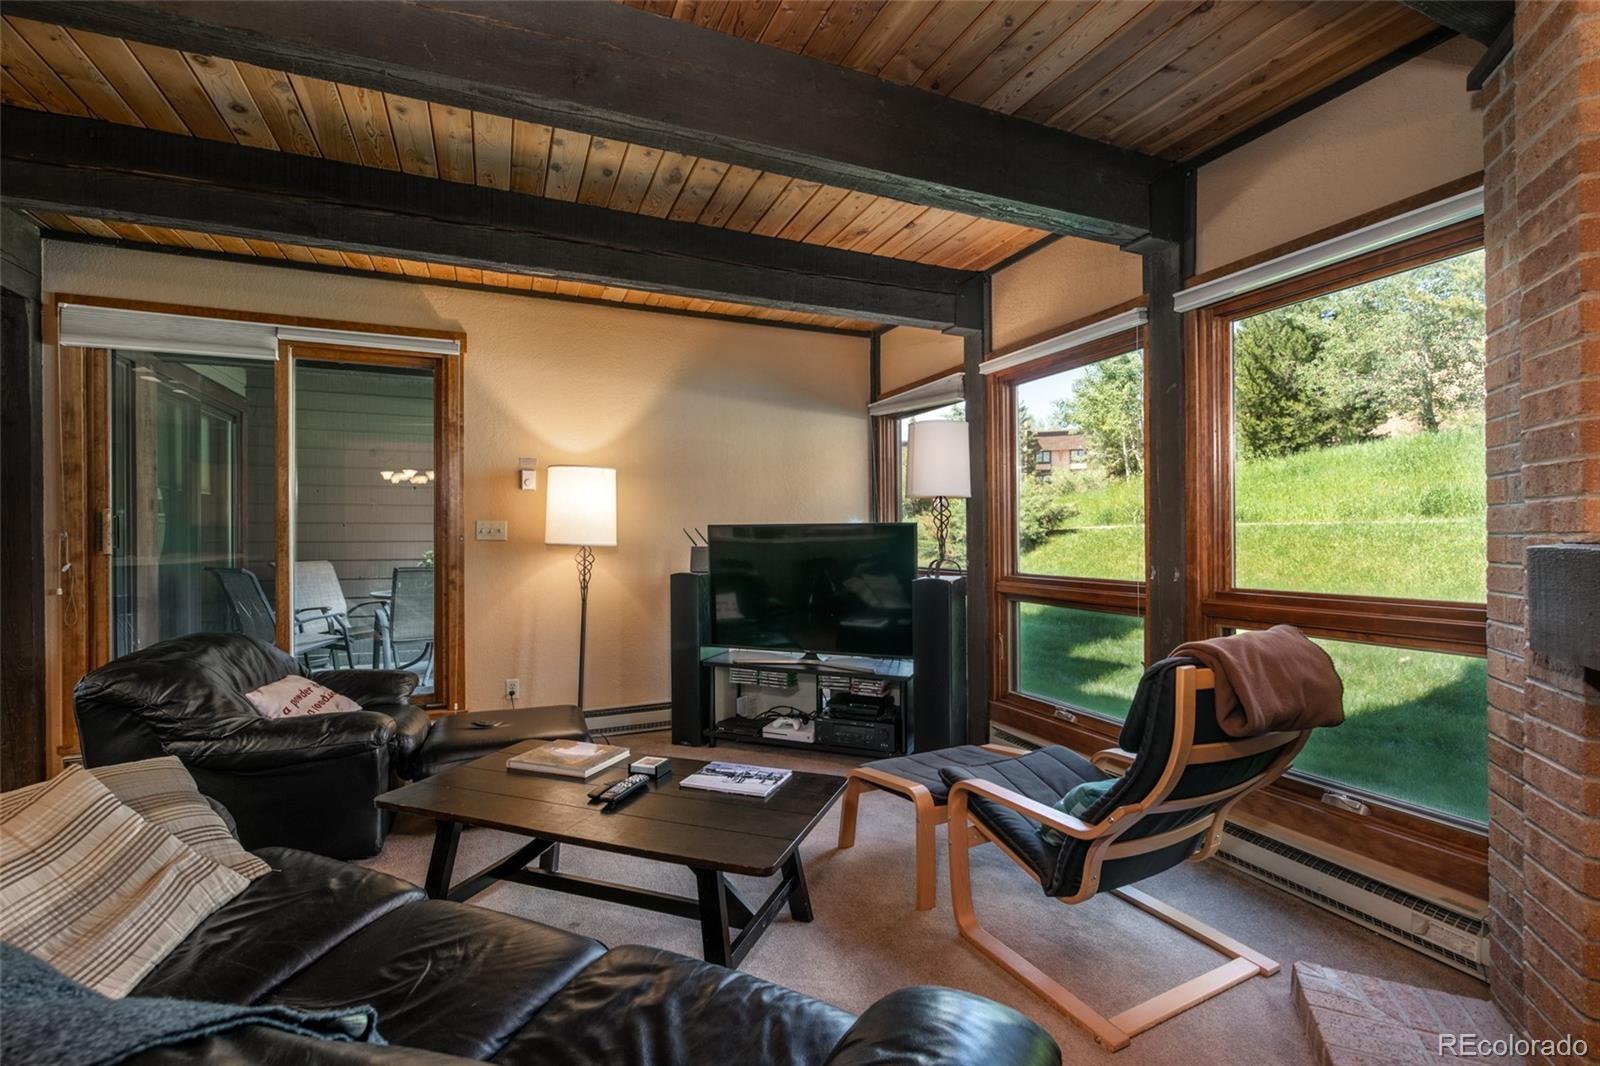 MLS# 6498865 - 4 - 2700 Village Drive #105, Steamboat Springs, CO 80487